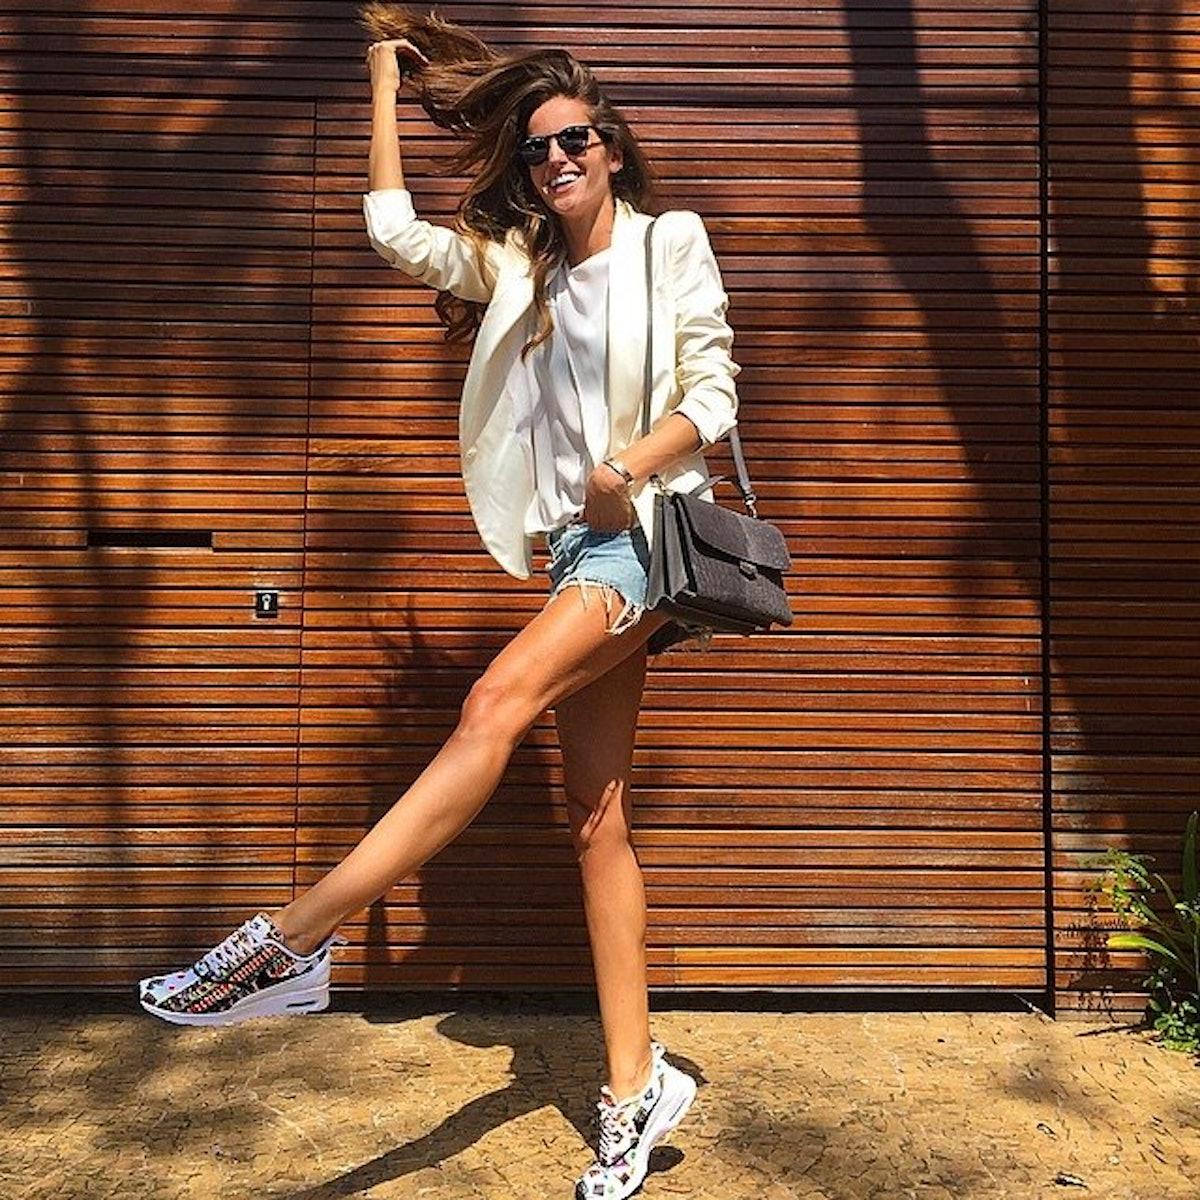 Model Jorts Instagram